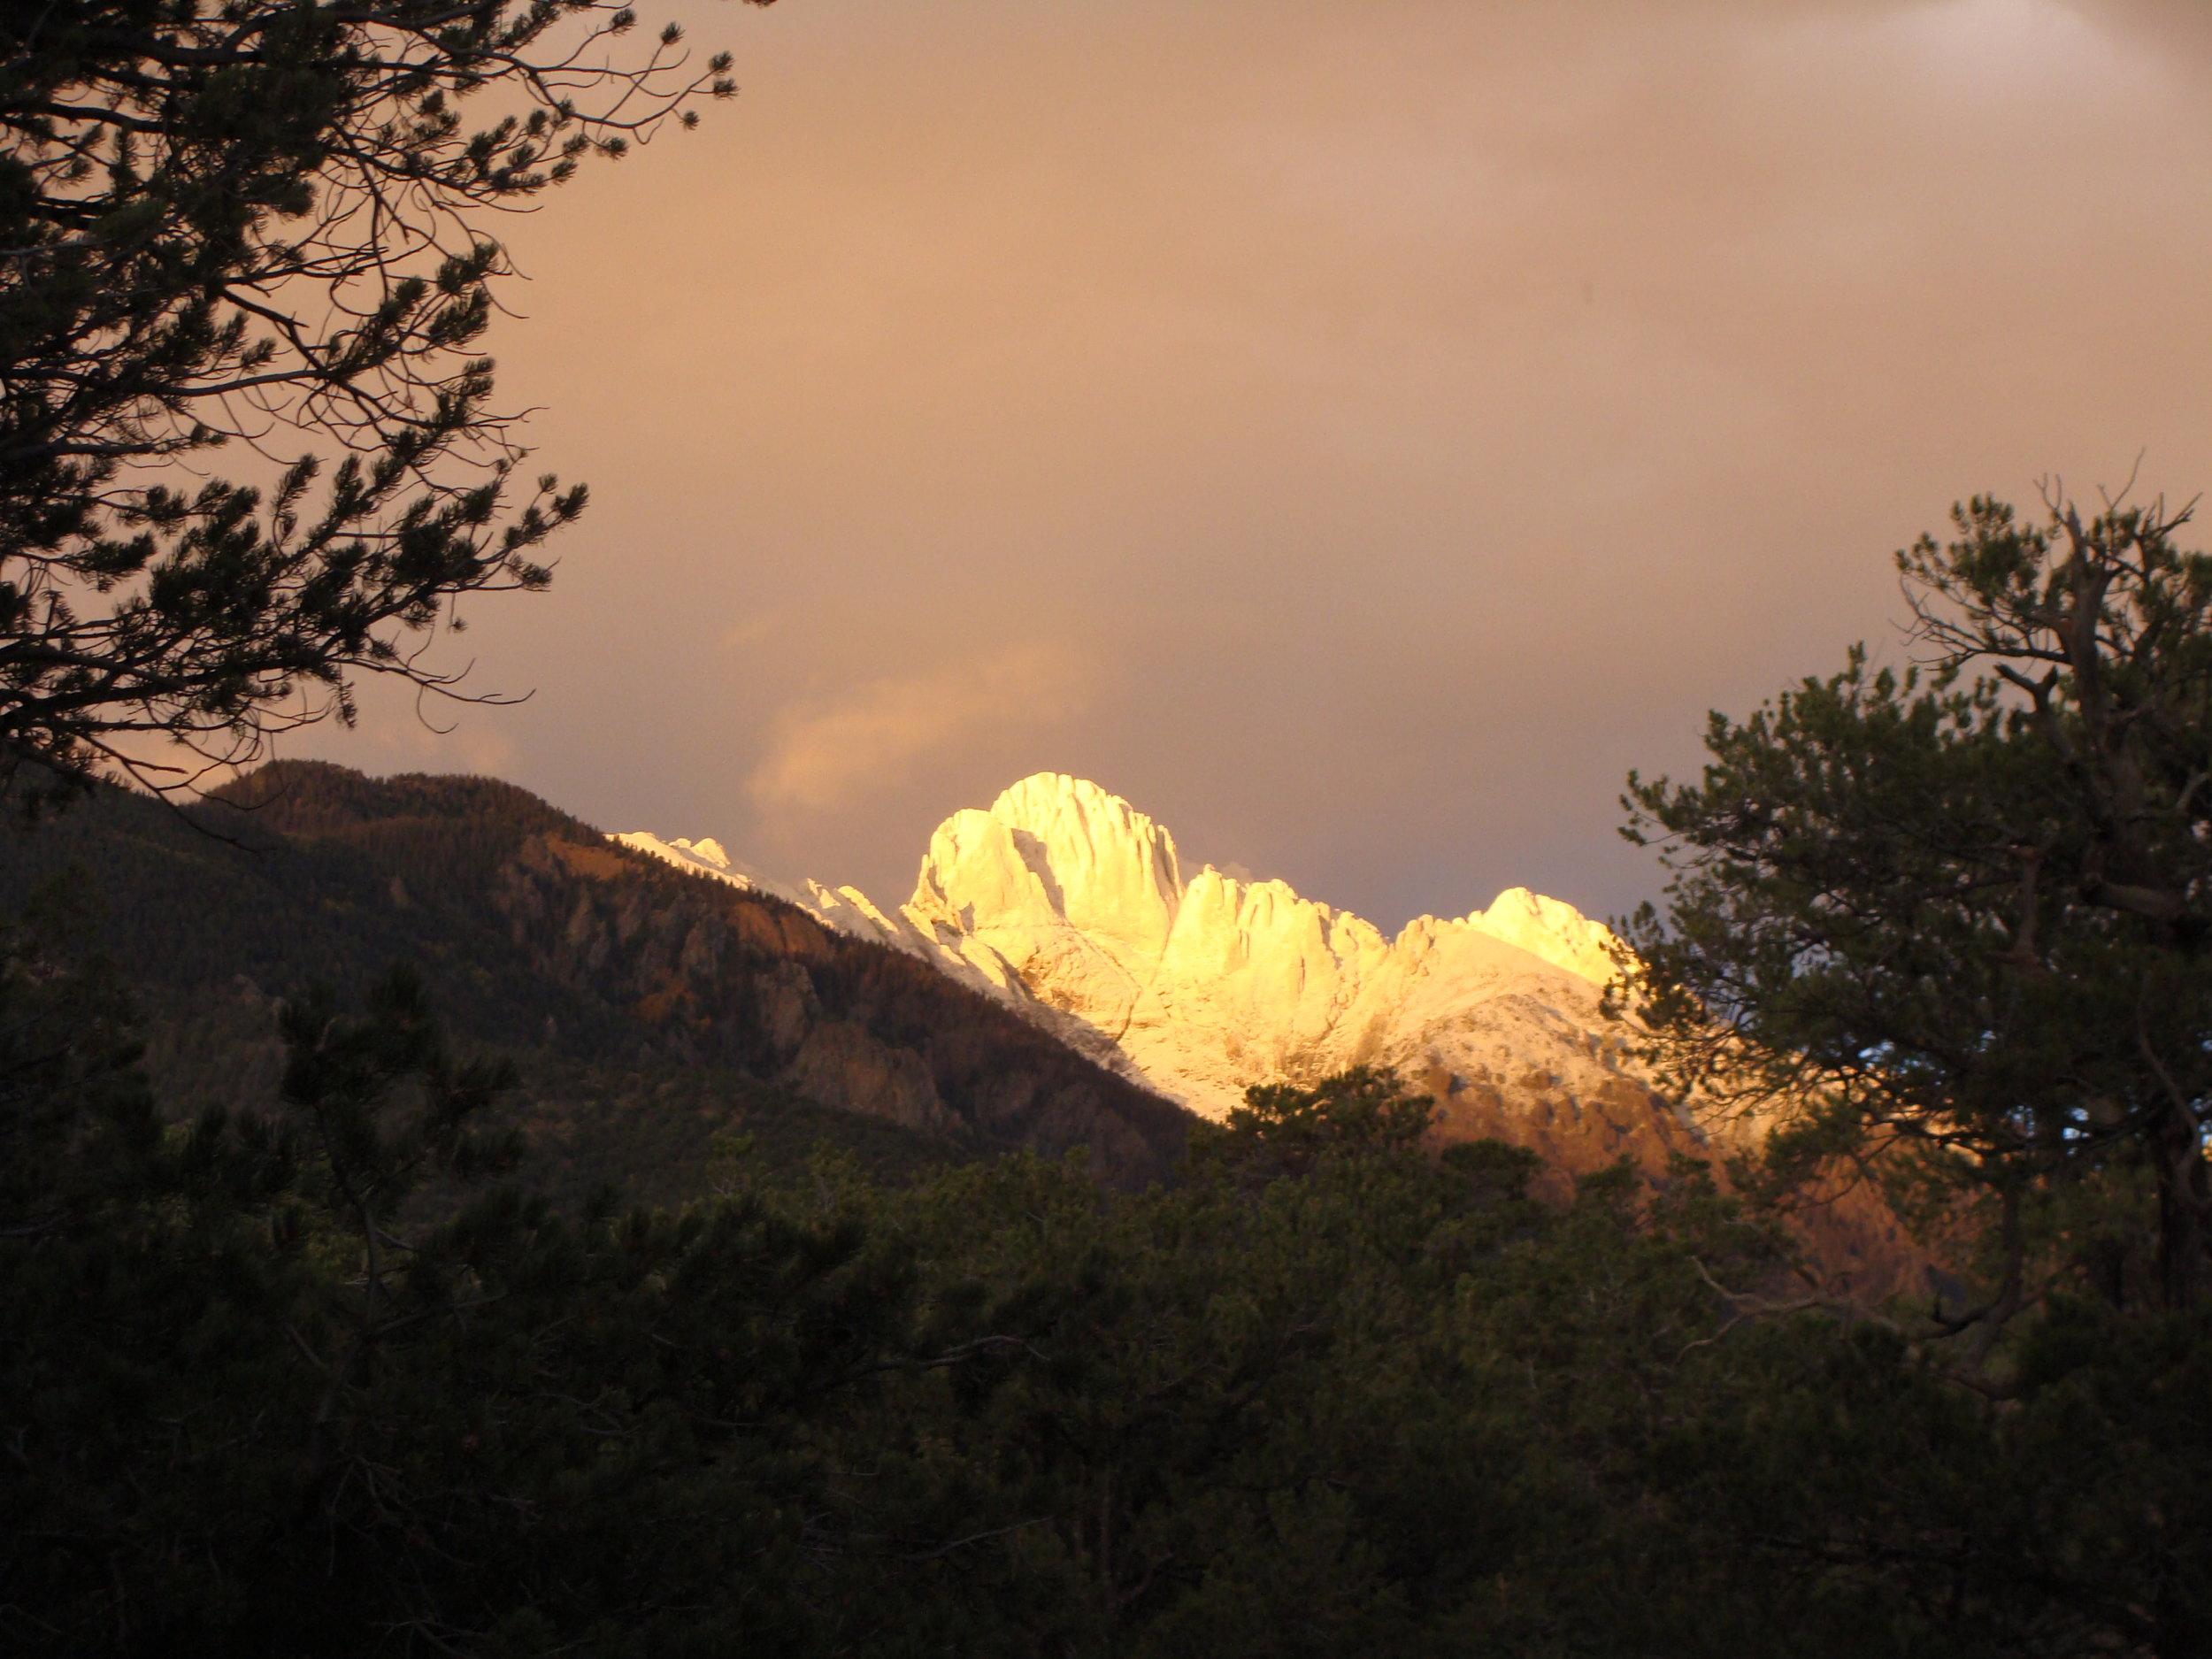 Season's first snow on the peaks